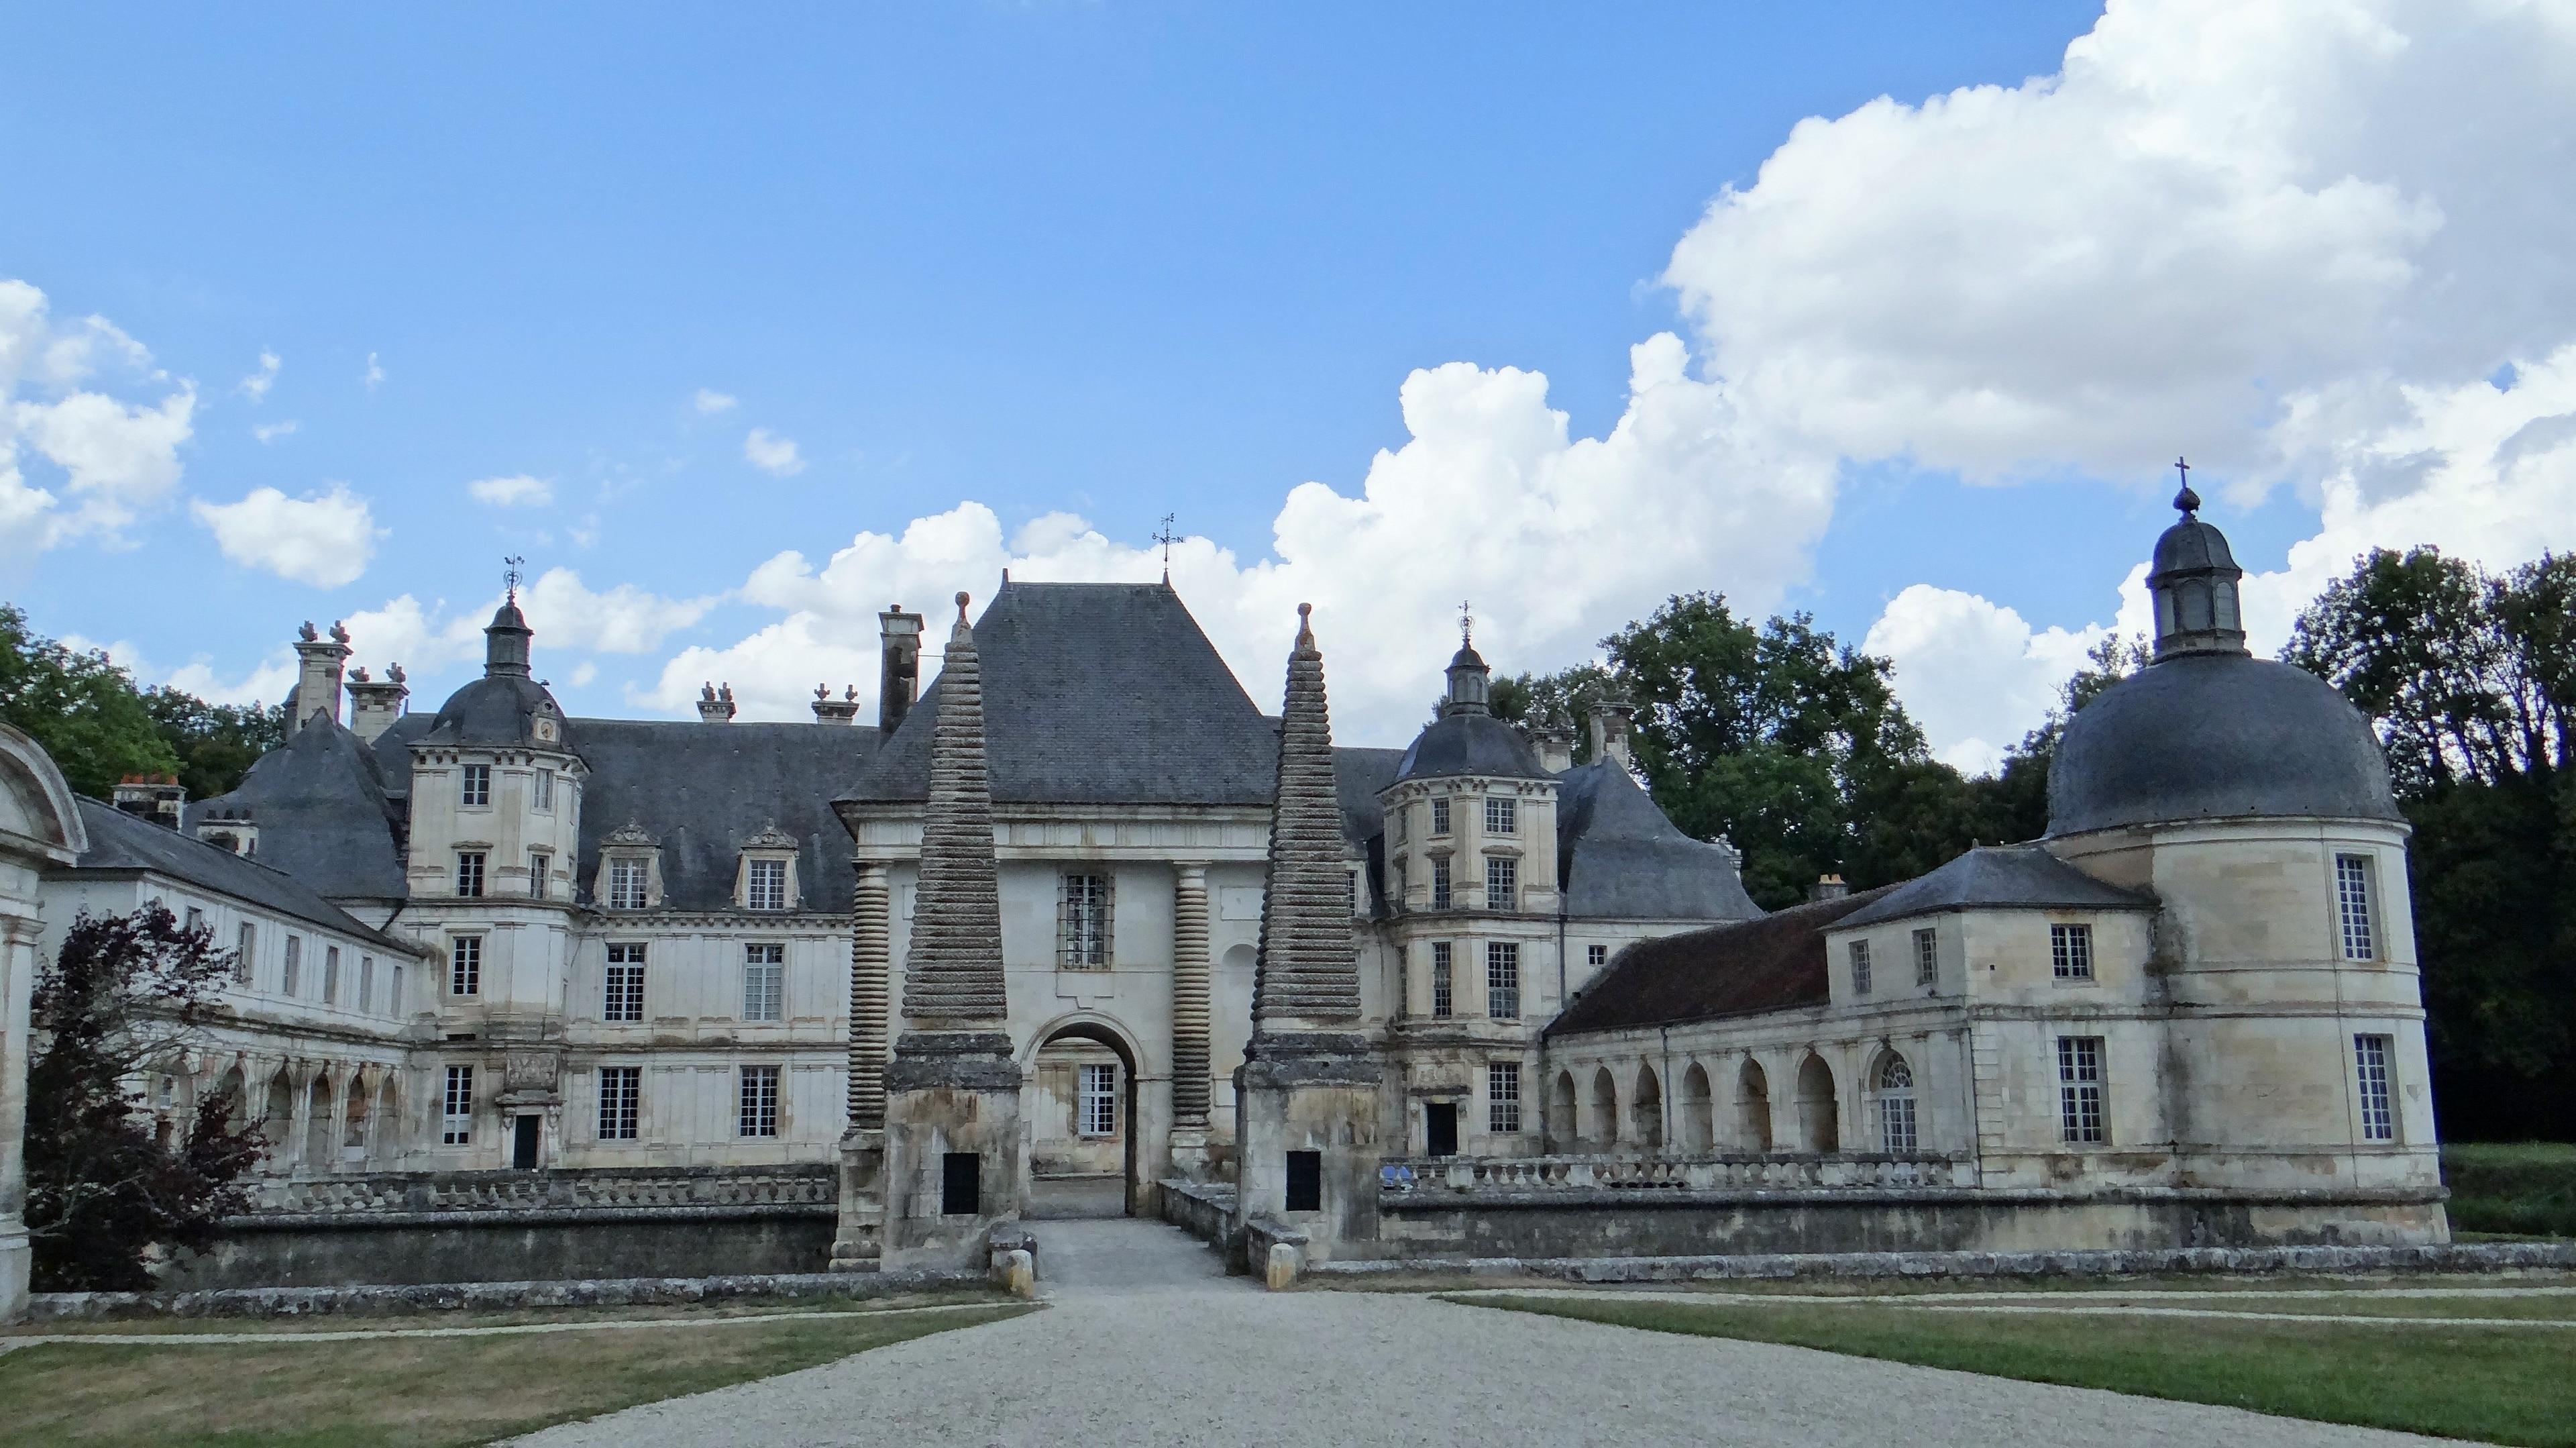 Tanlay, Yonne, France